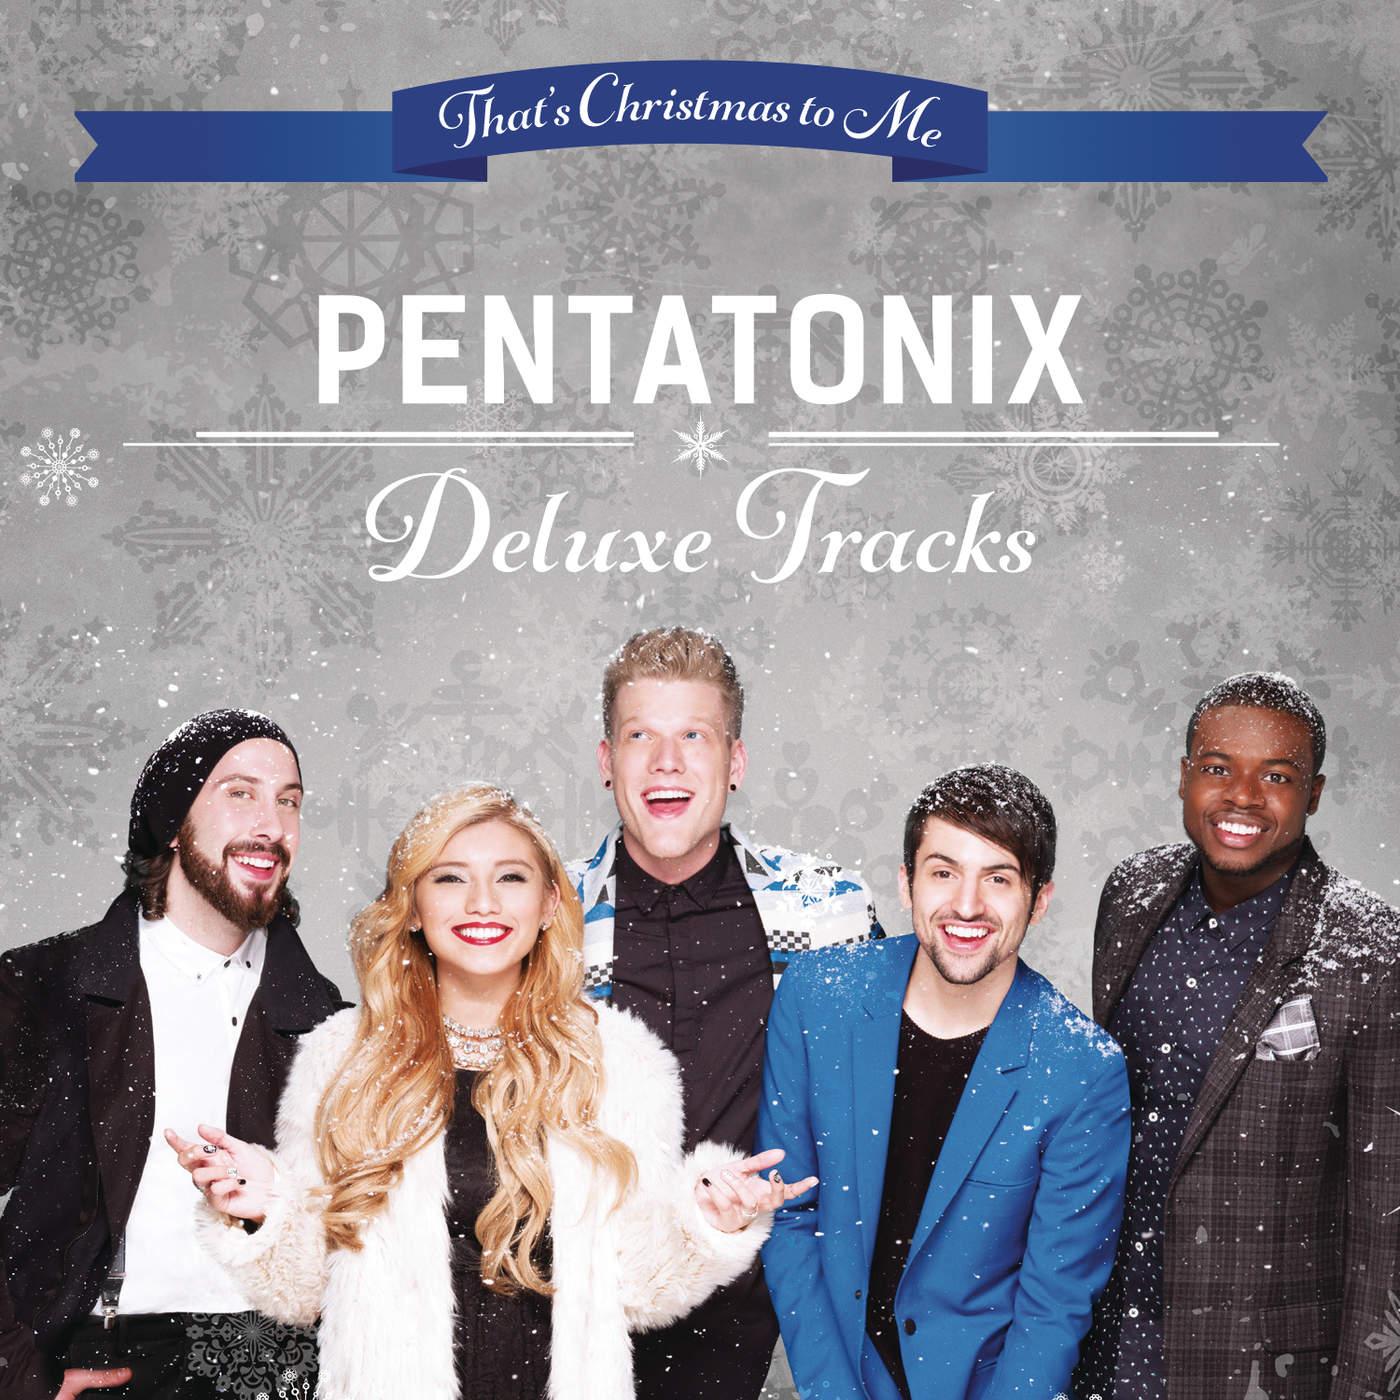 Pentatonix Christmas Cd 2019.That S Christmas To Me Deluxe Tracks Ep 2015 Pop